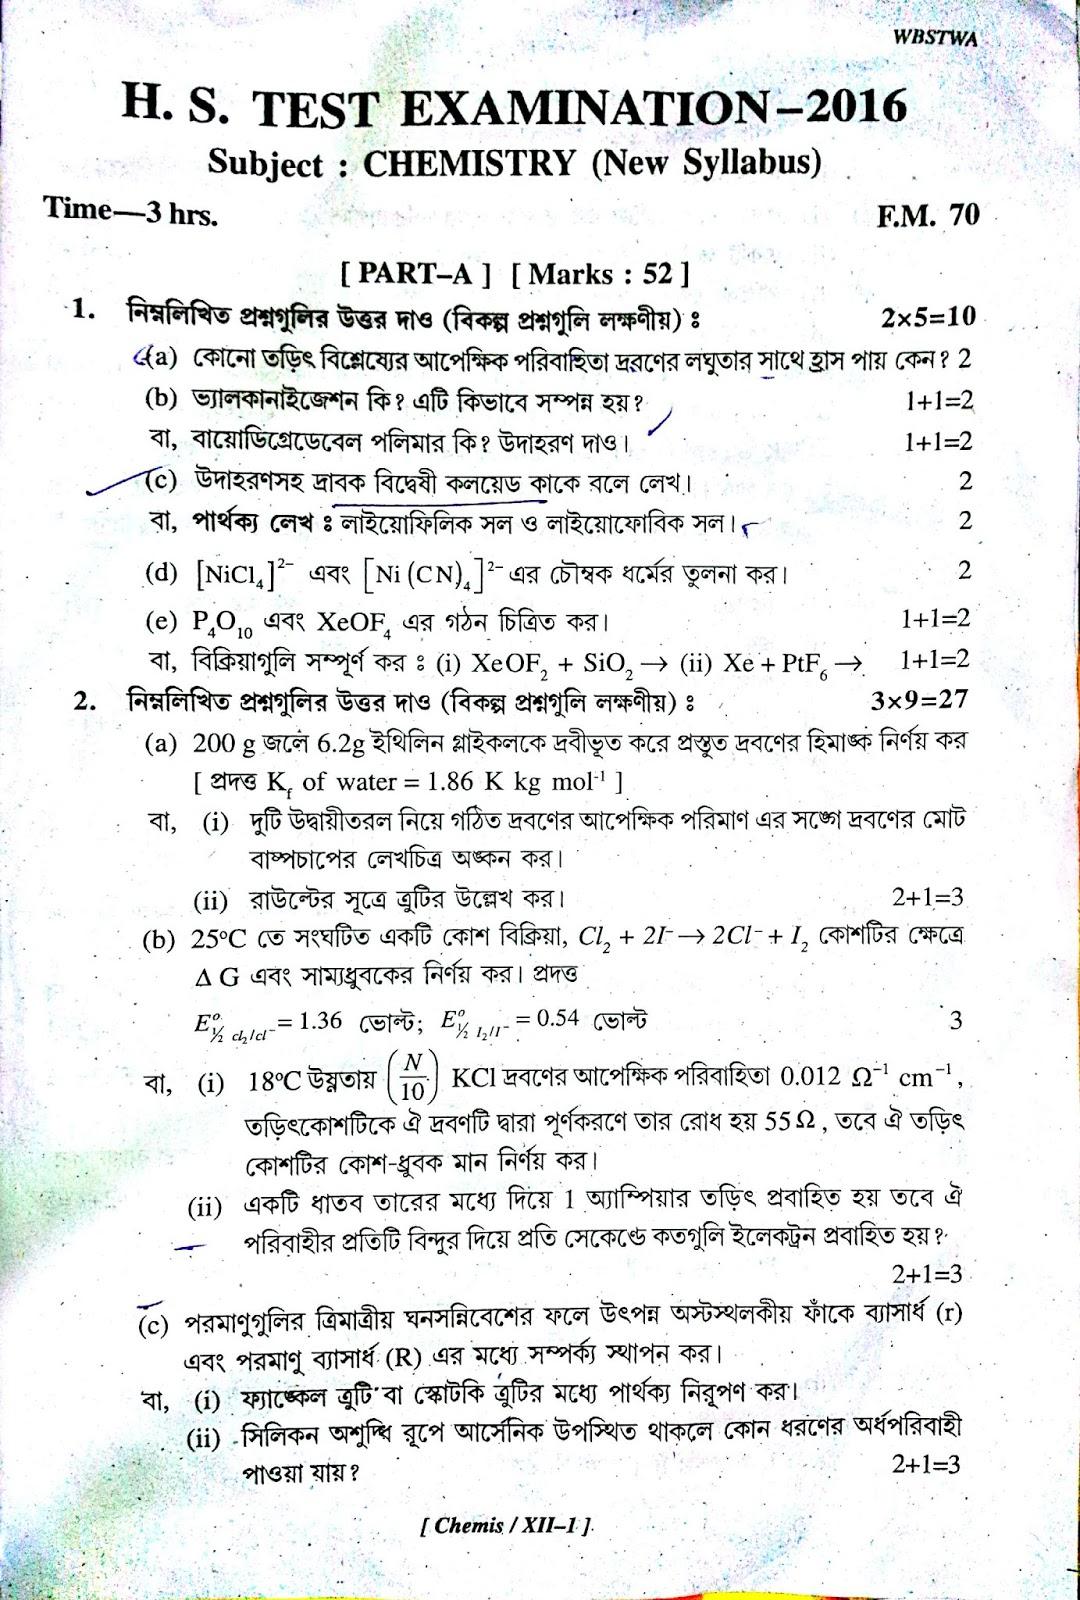 Aff3111 final exam paper